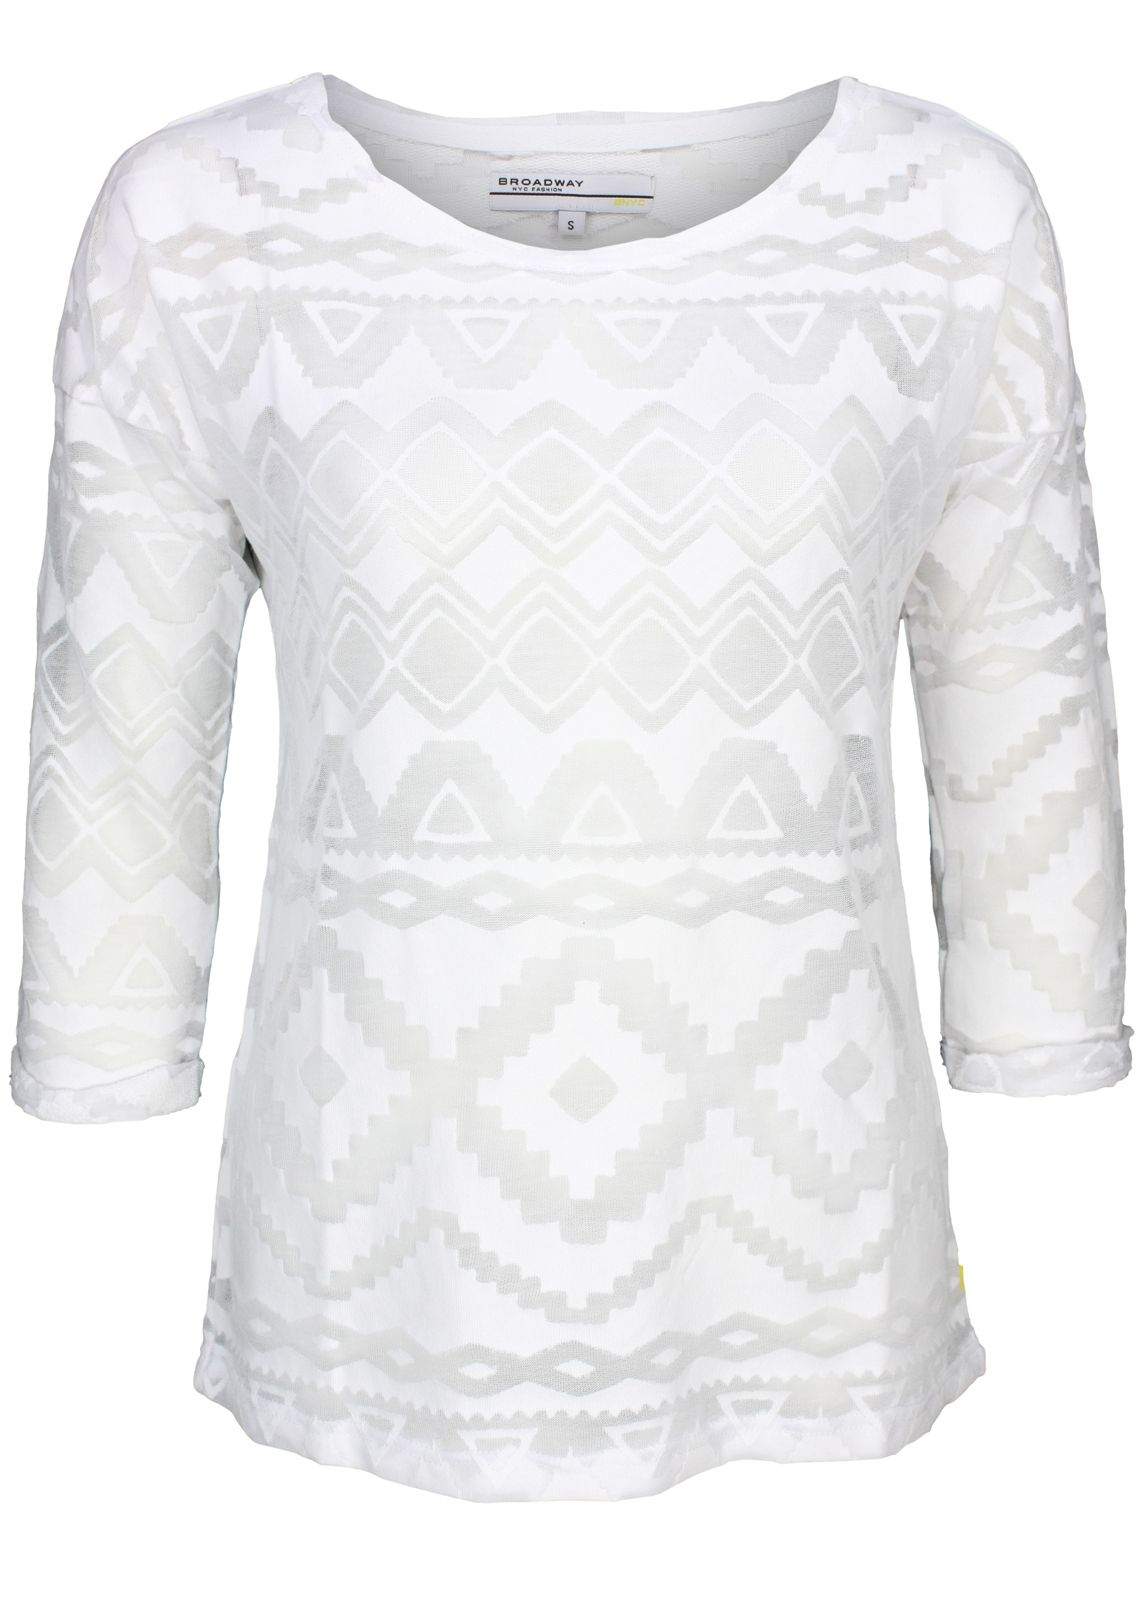 sports shoes effc7 ee9ee Broadway NYC Pullover Sweatshirt weiß - fettebeute Online Shop